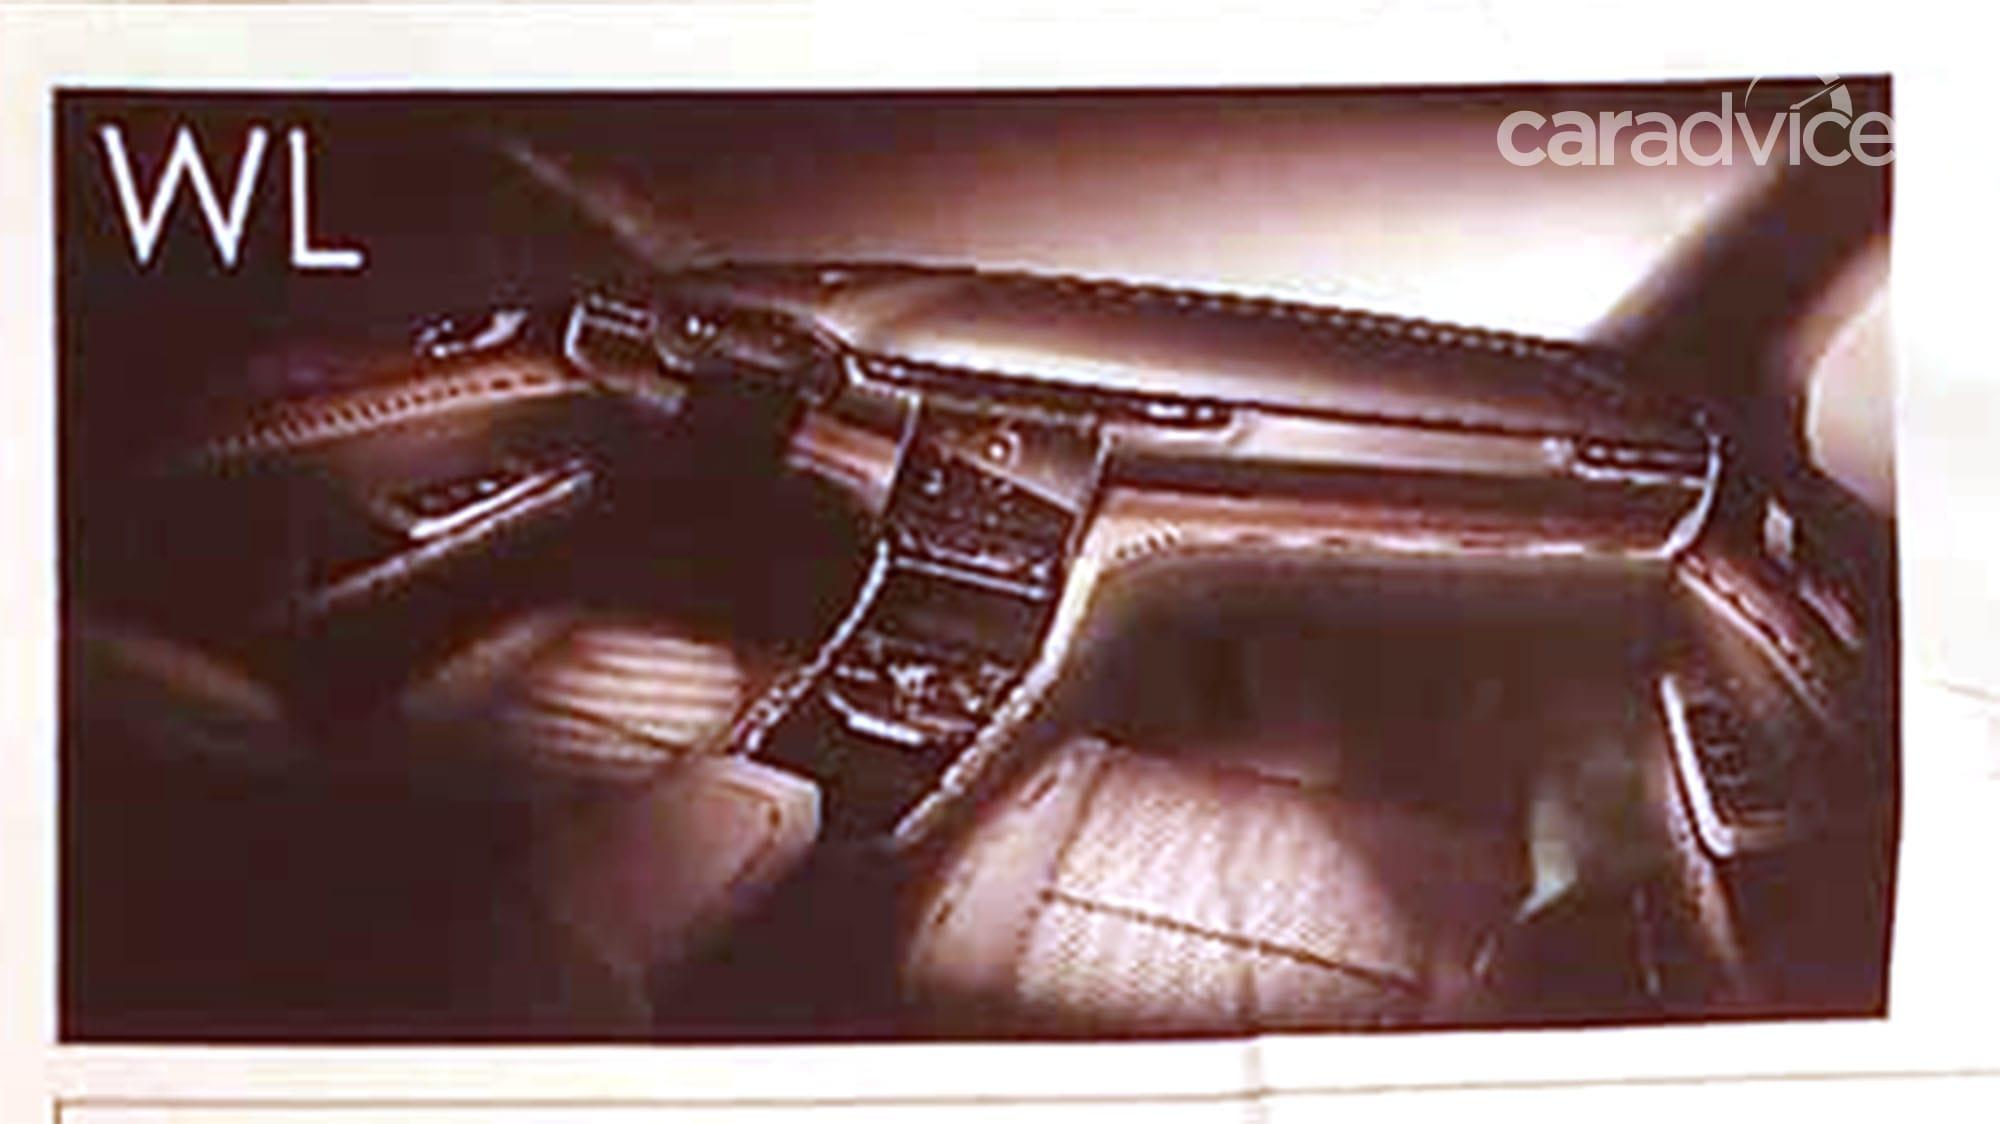 2021 Jeep Grand Cherokee interior design leaked | CarAdvice